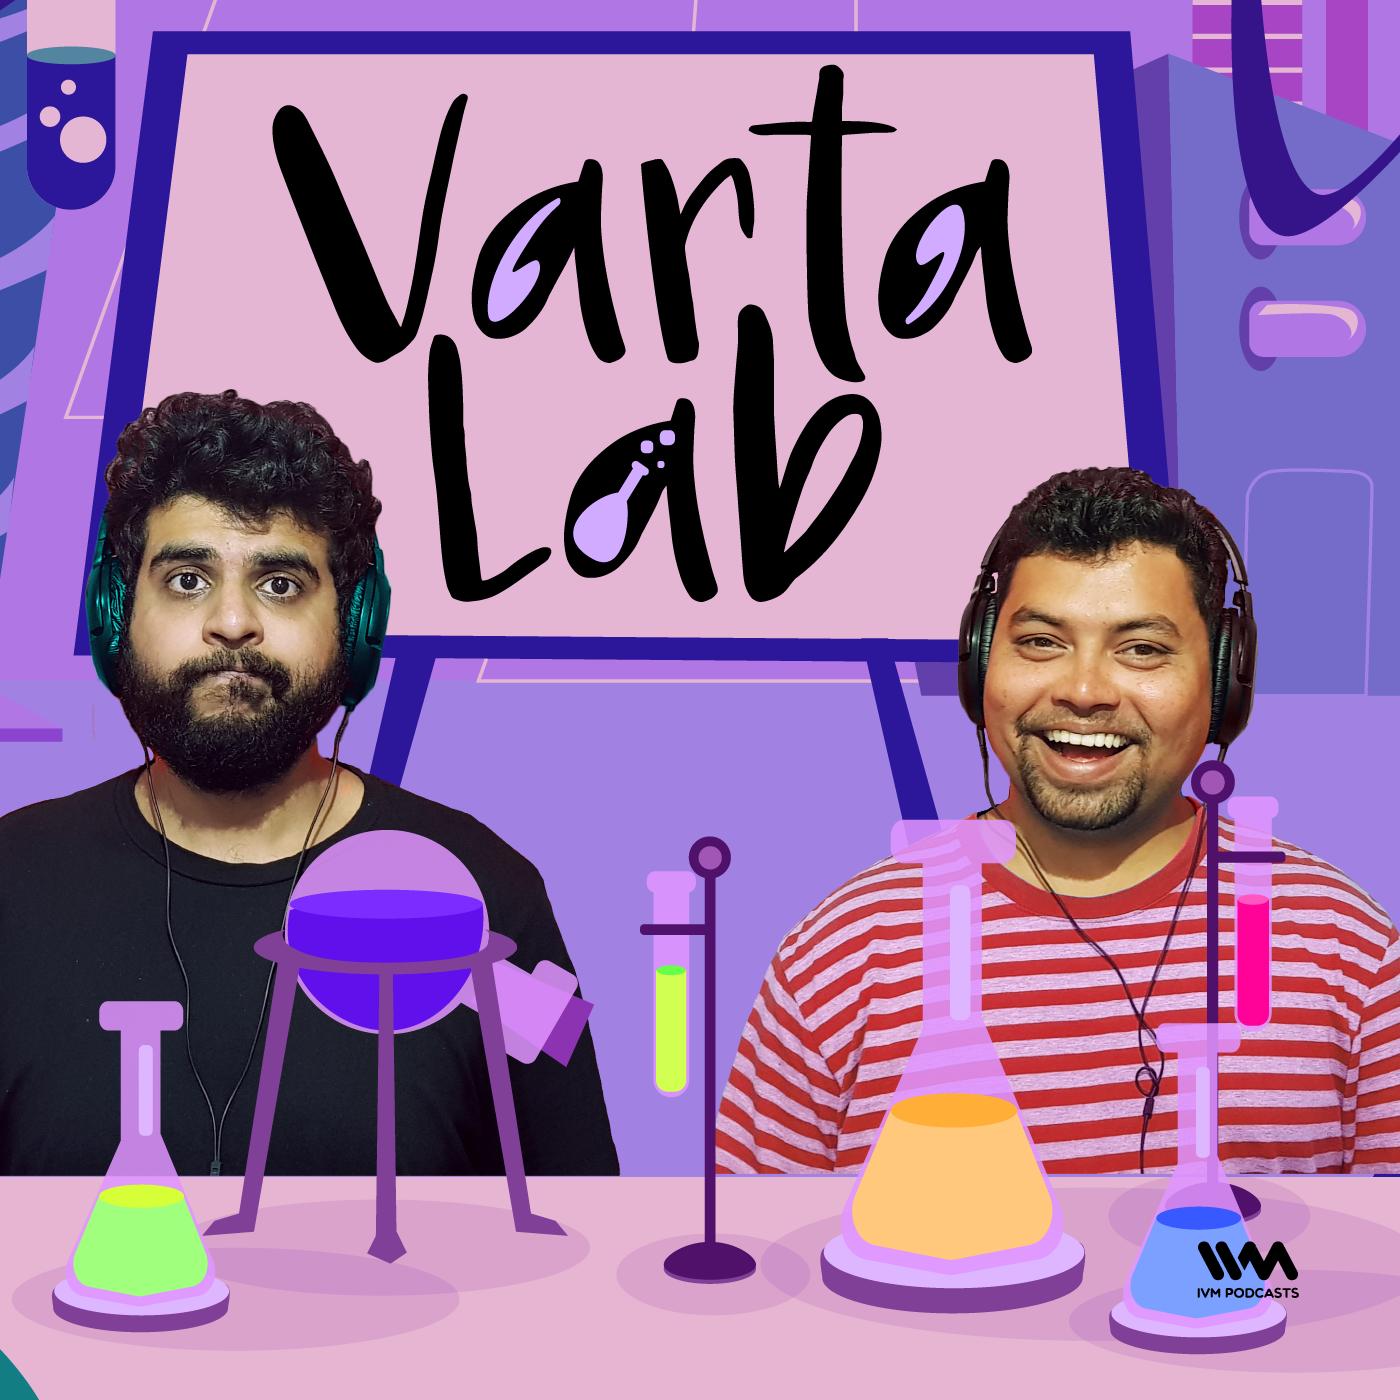 Varta Lab |